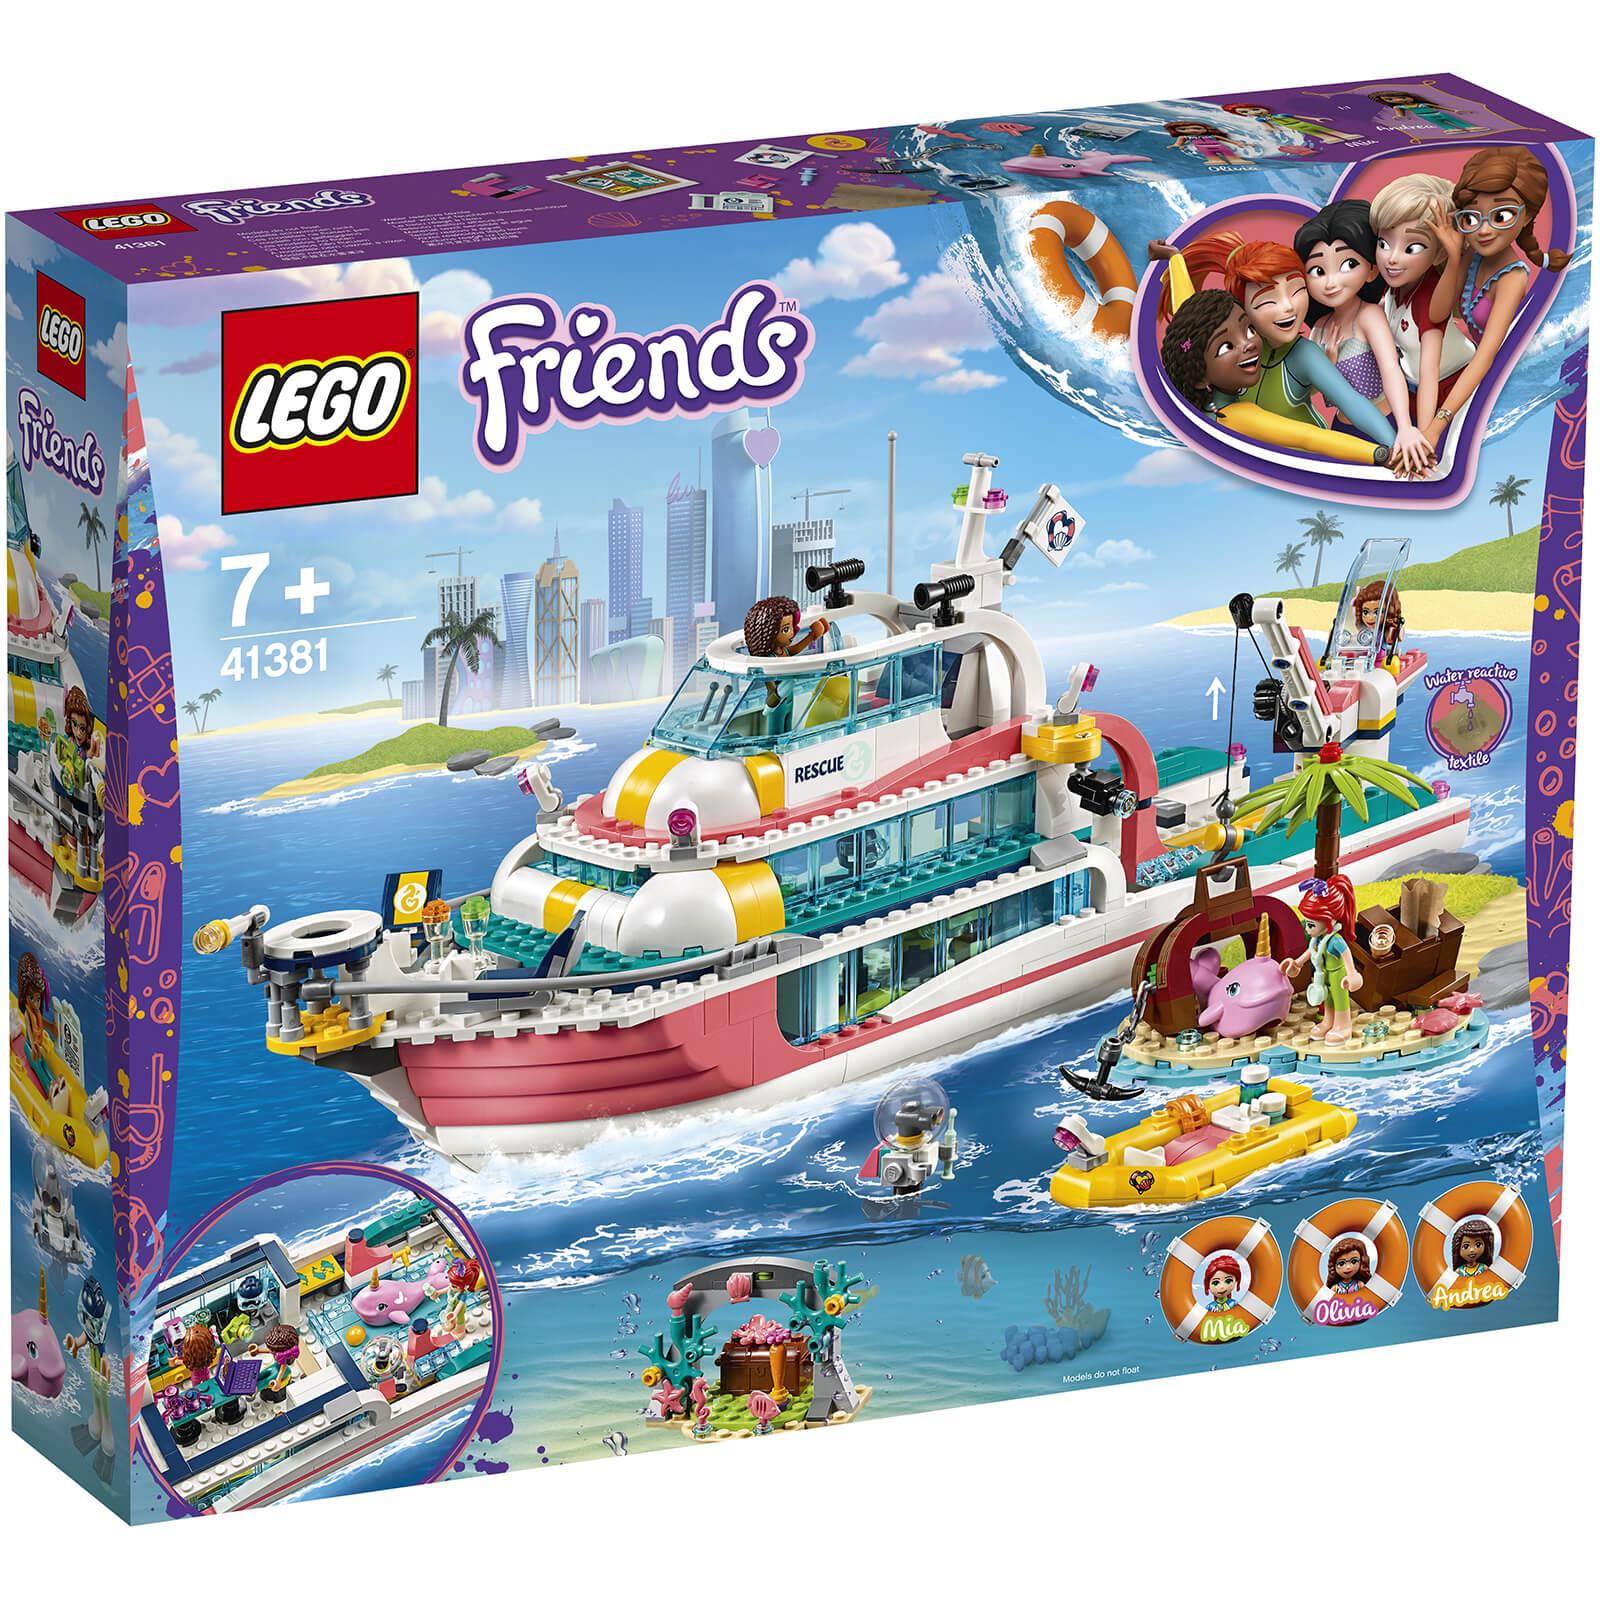 LEGO 乐高 Friends好朋友系列 41381 海上爱心救援船